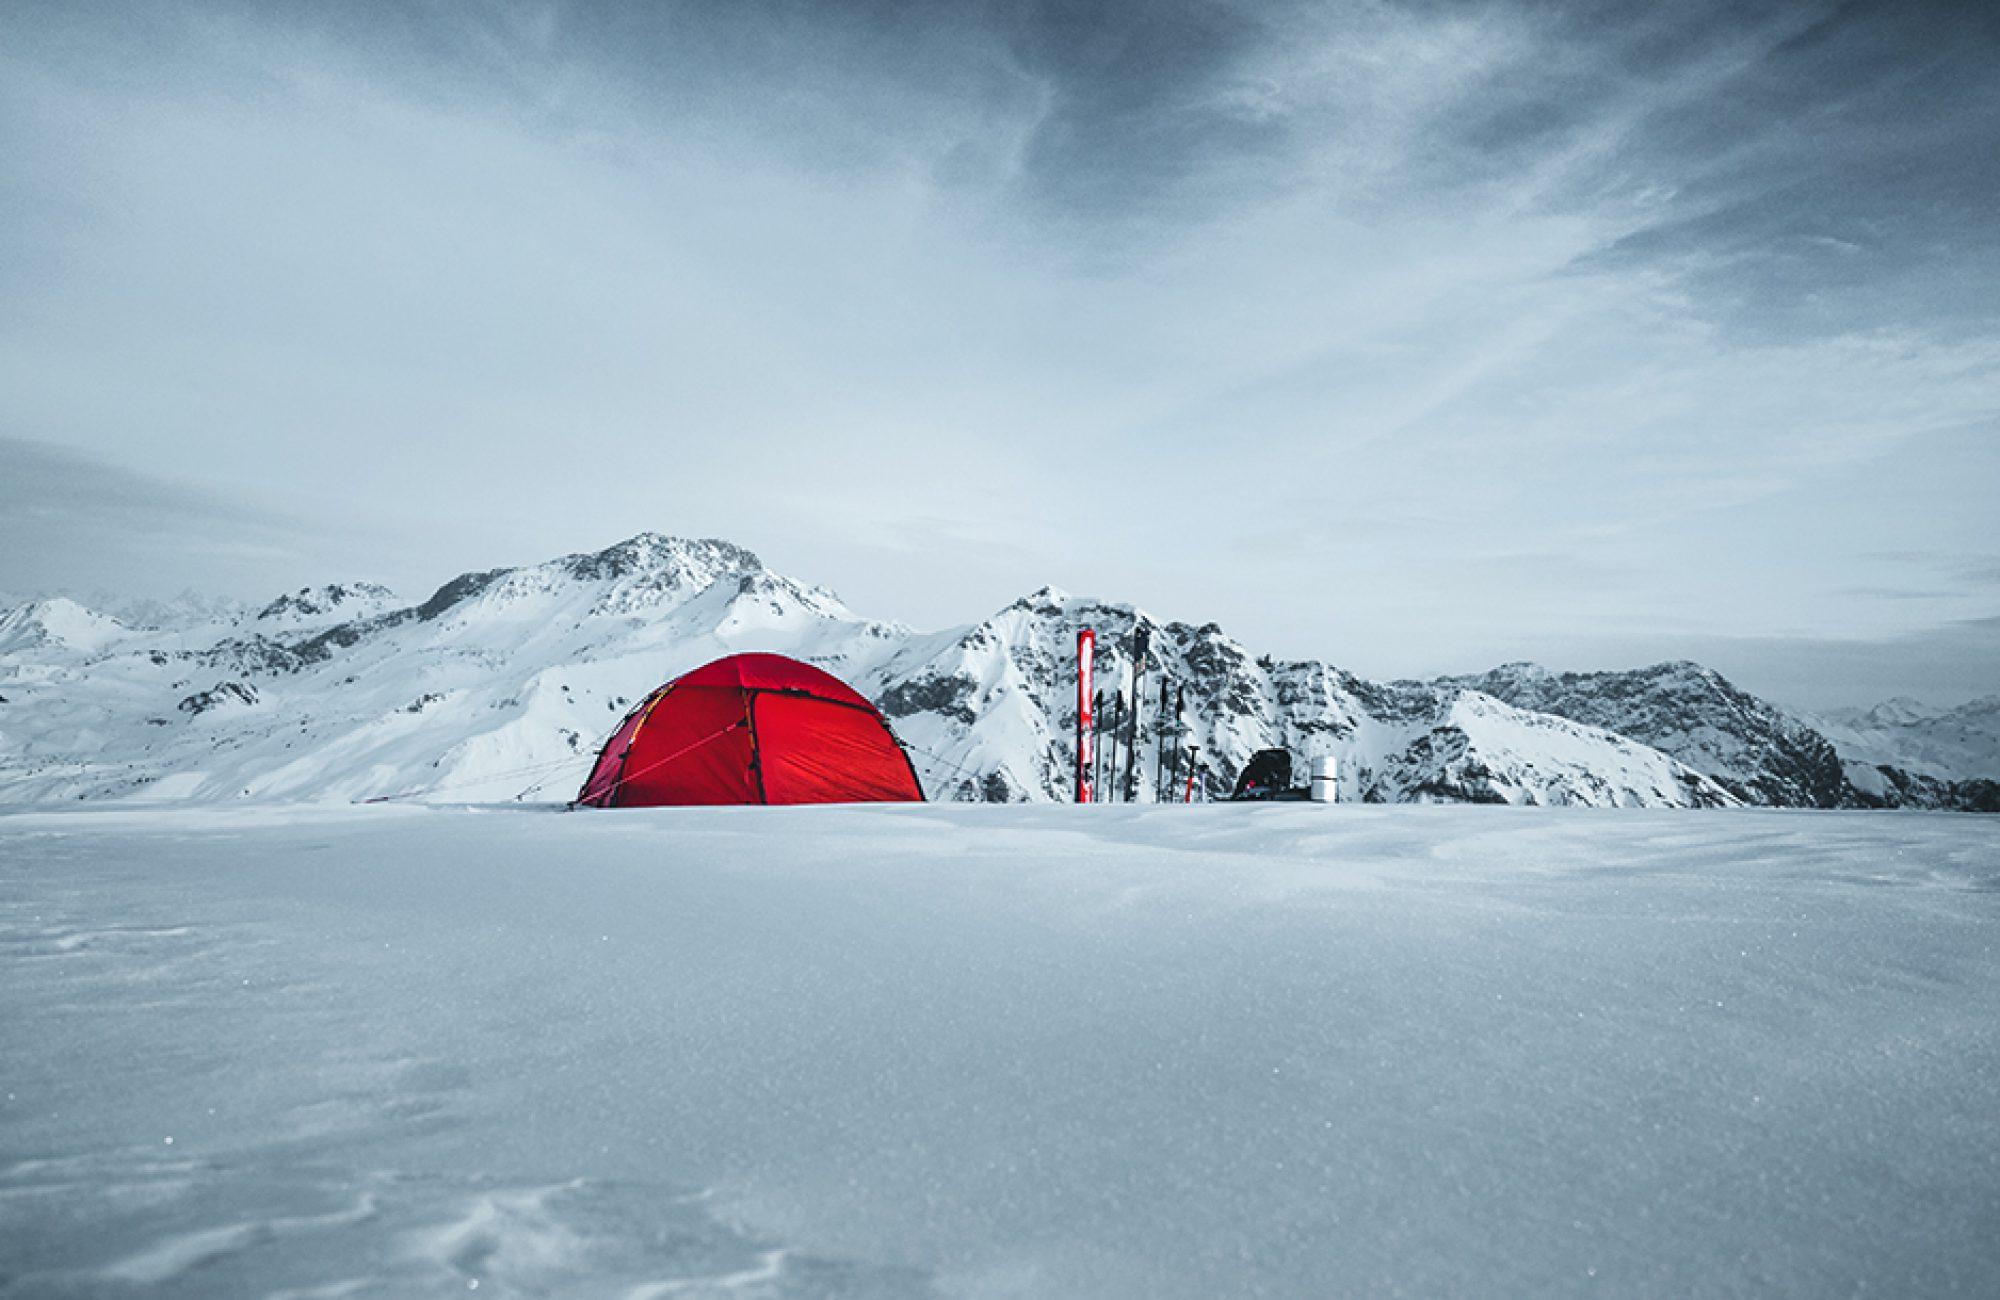 Rotes Zelt im Winter auf Skitour, Wintercamping